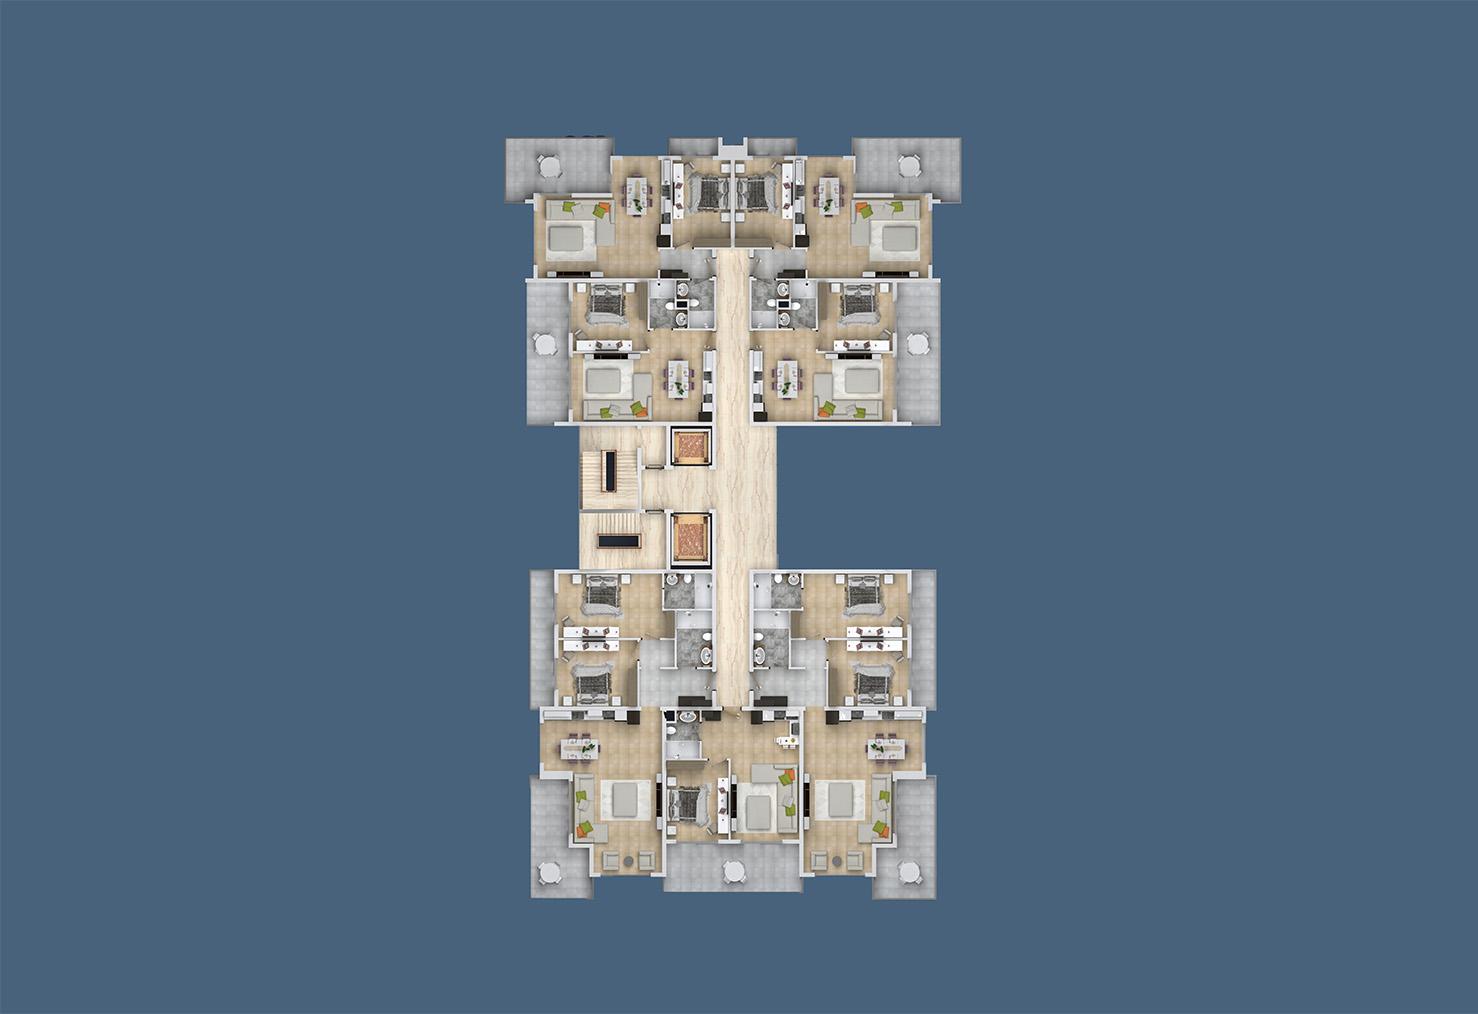 Floor plans of apartments 10 floor «D» Yekta Kingdom Trade Center